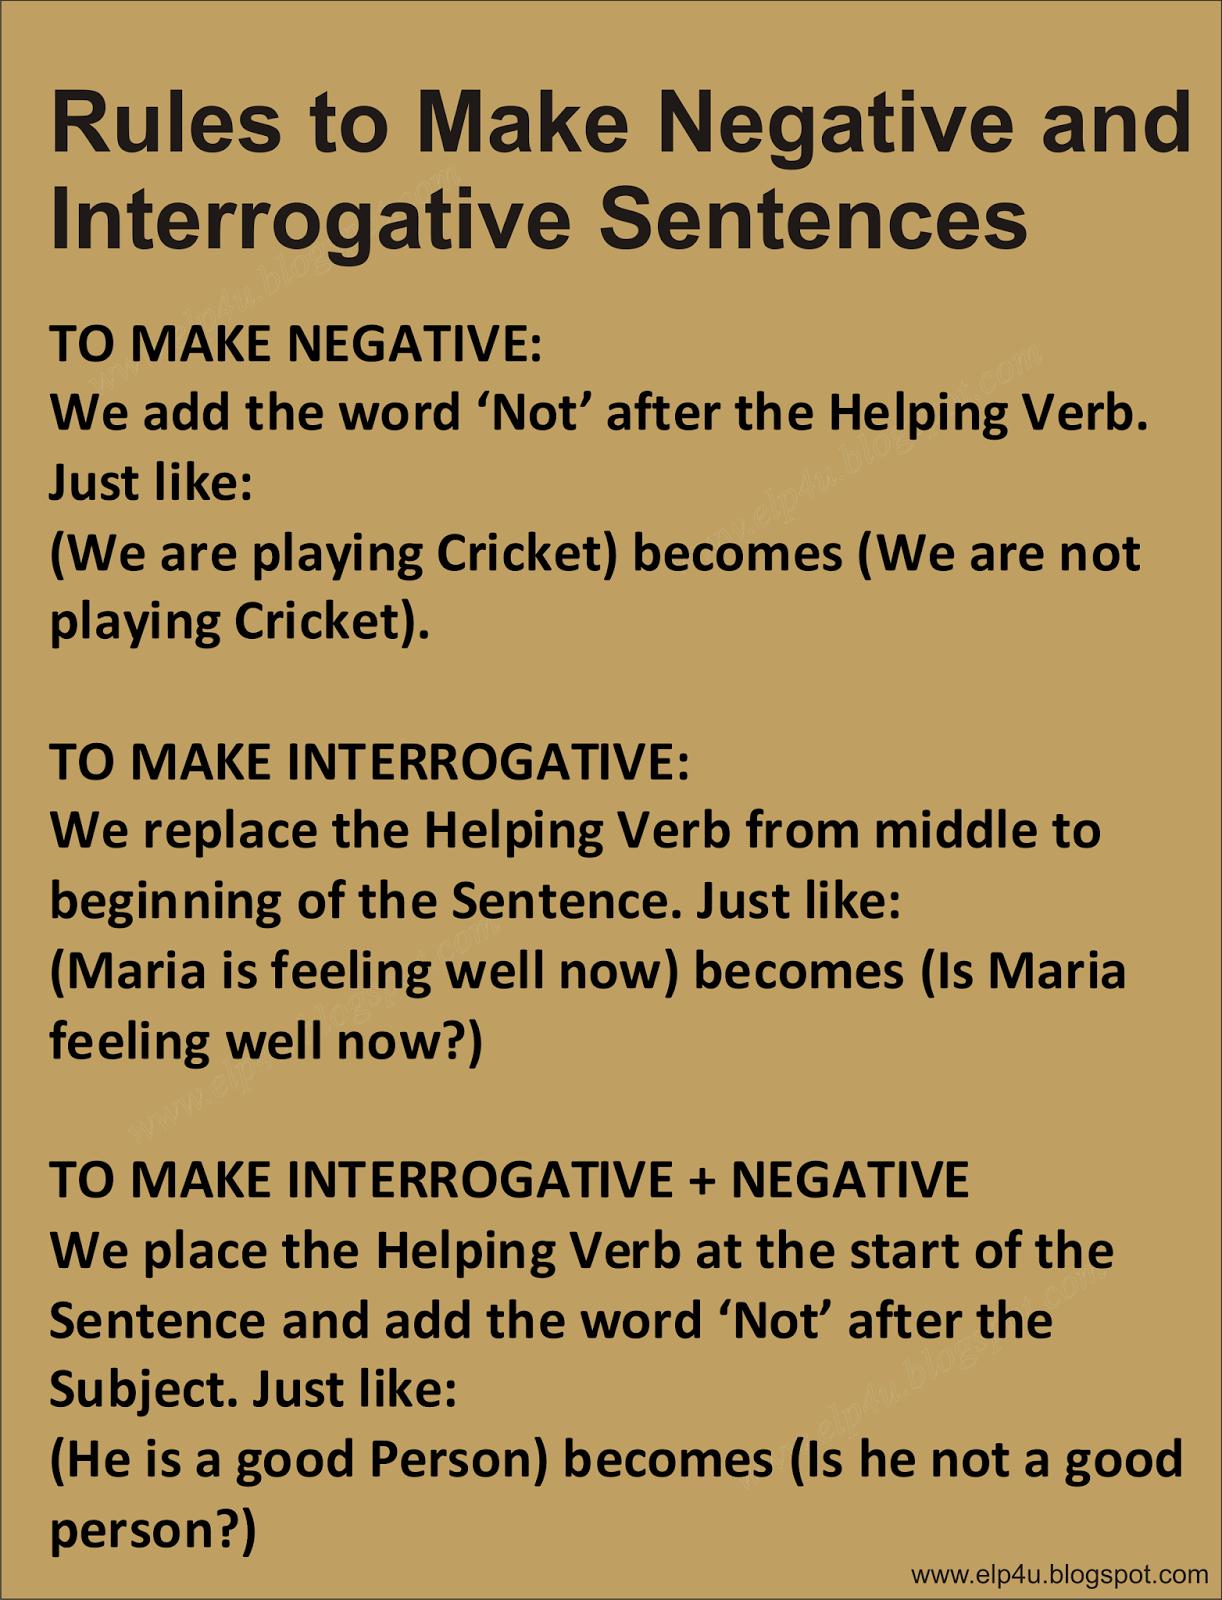 Rules To Make Negative And Interrogative Sentences